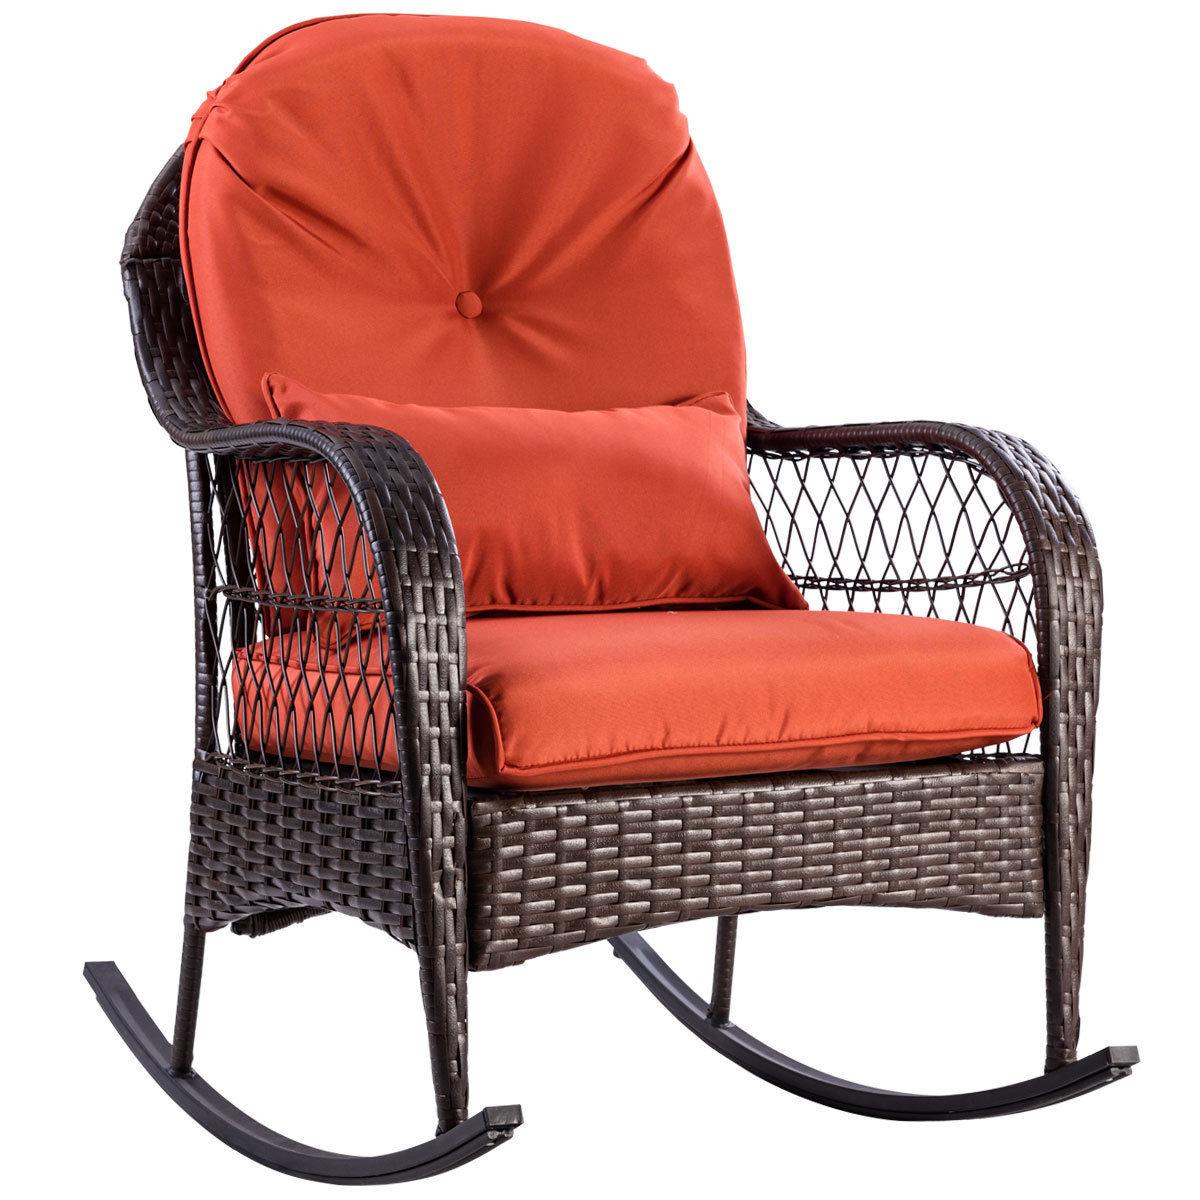 Rattan Wicker Rocking Chair Cushion Walmart Game Chairs X Rocker Giantex Patio Modern Porch